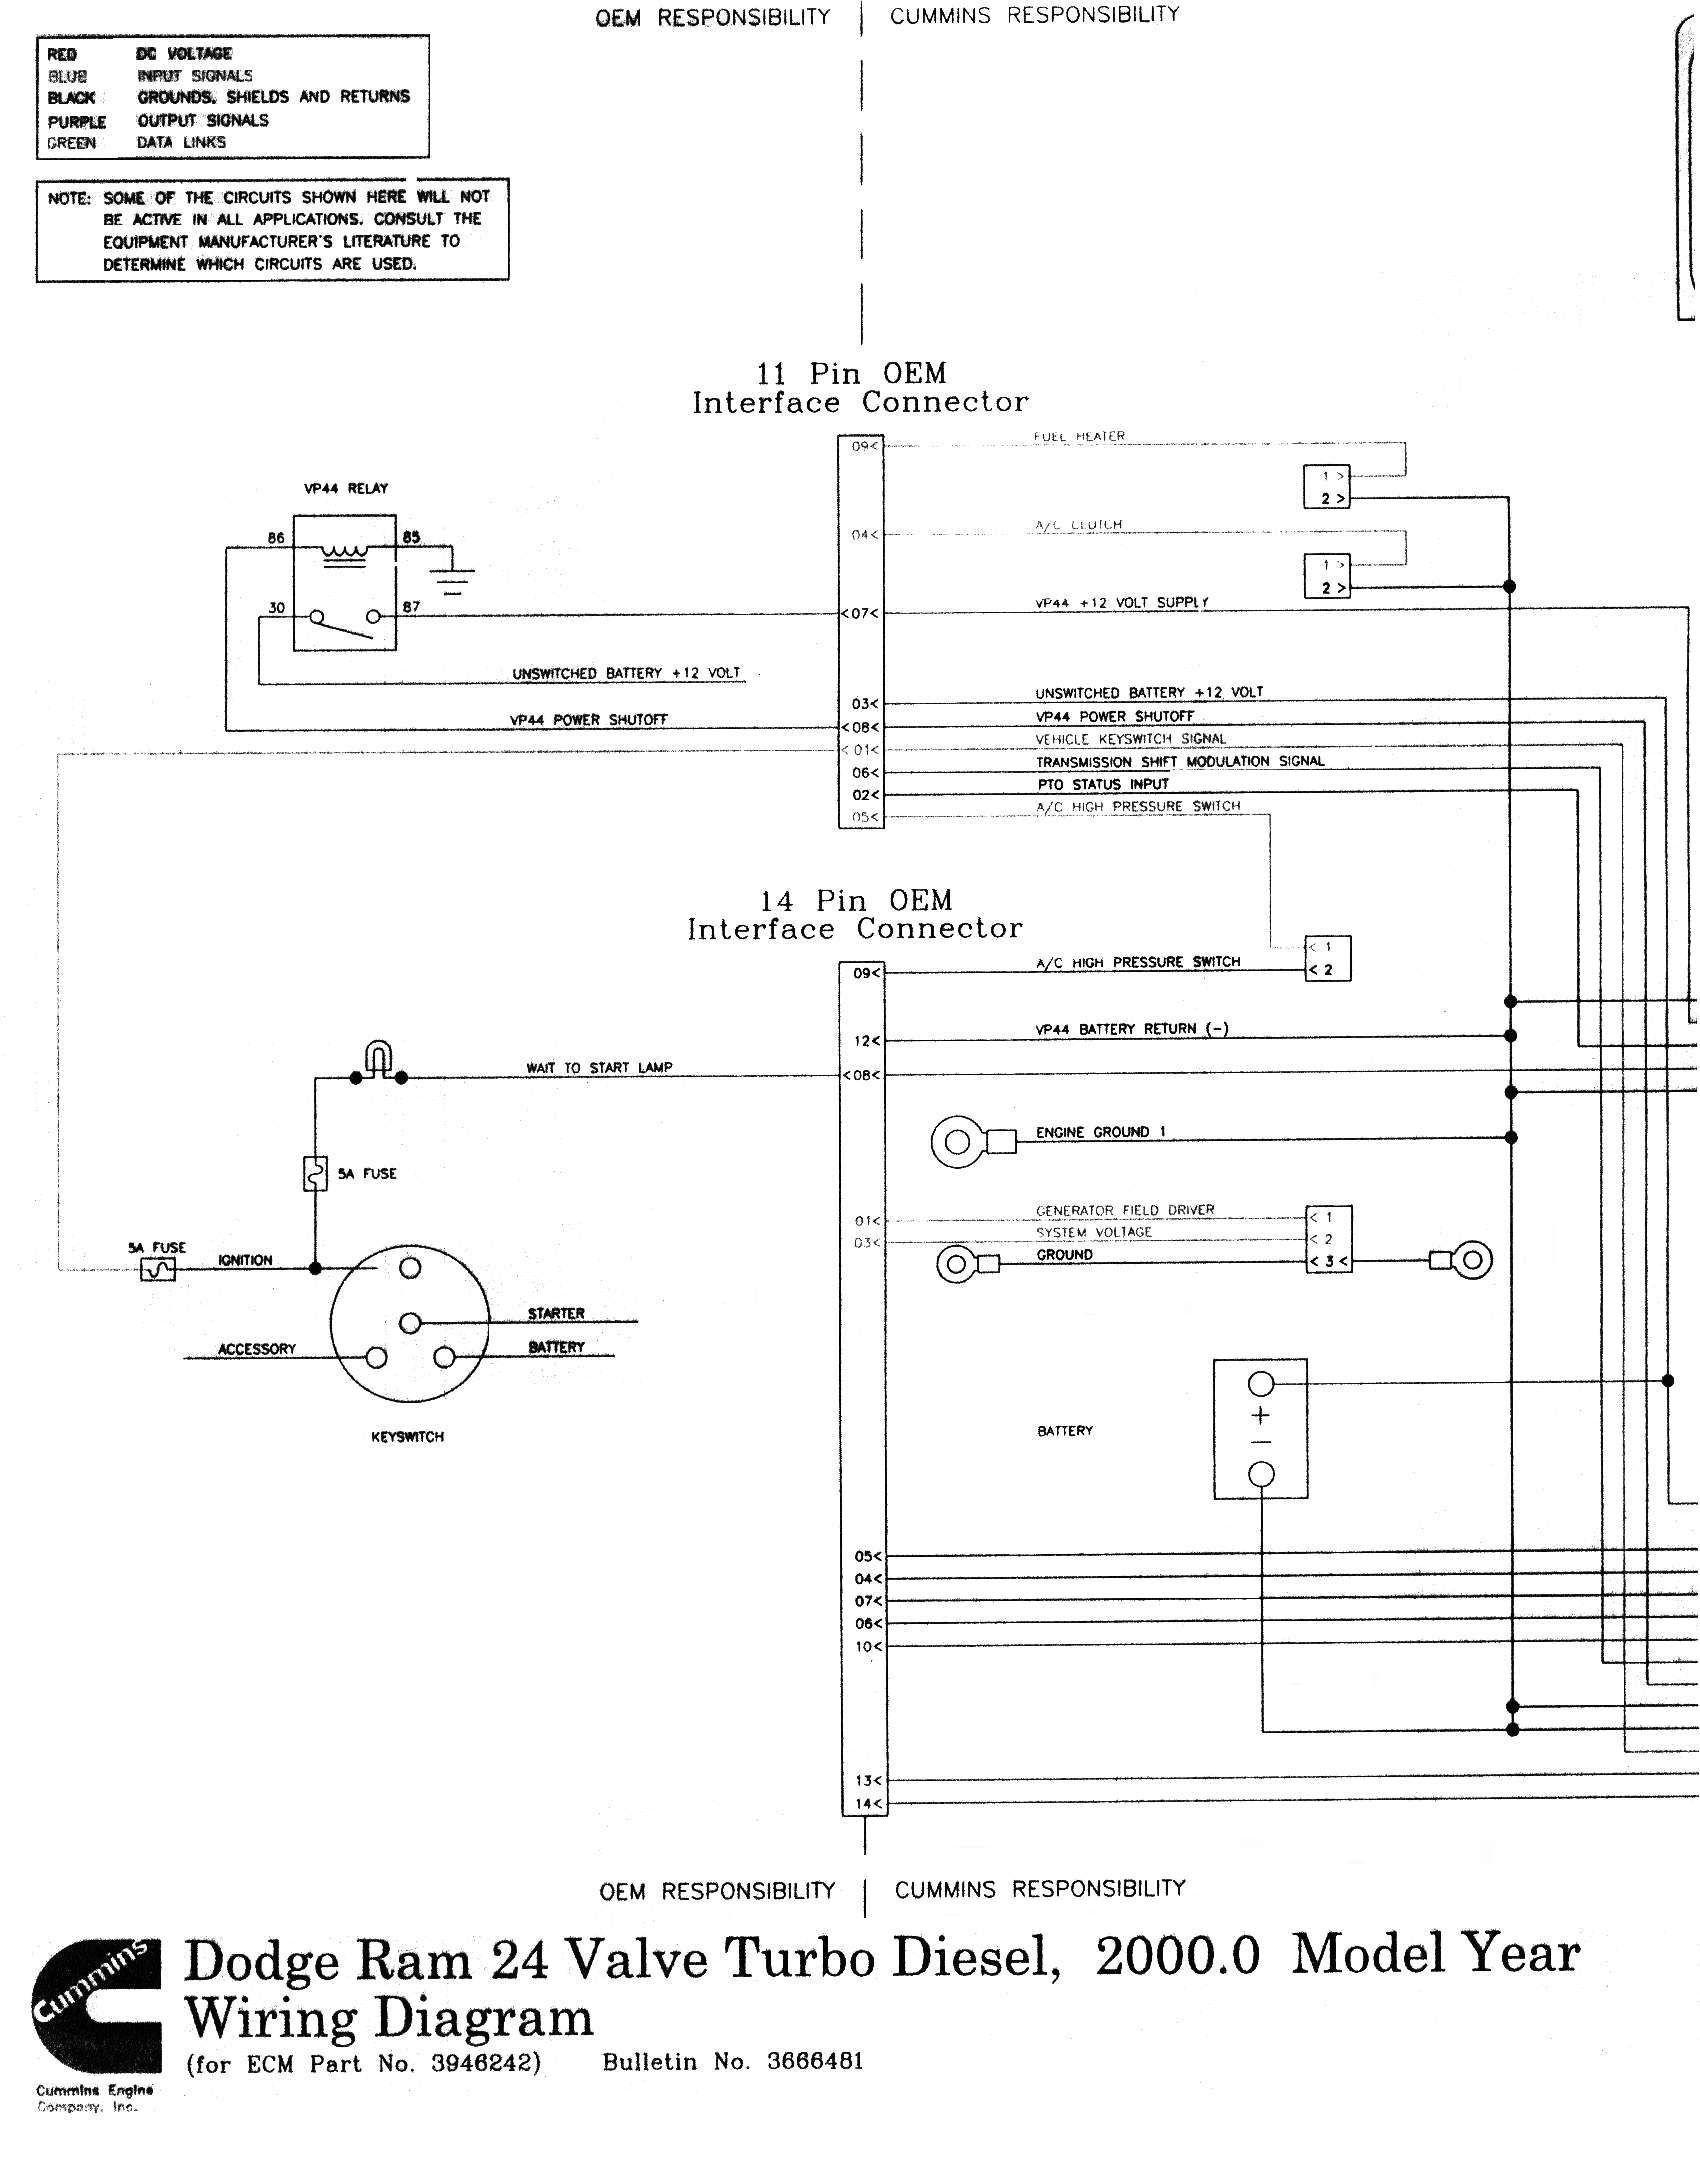 Cummins Diesel Engine Diagram | Dodge trucks ram, Dodge ram diesel, Cummins | Wiring Diagram For 2002 Dodge Ram 2500 |  | Pinterest